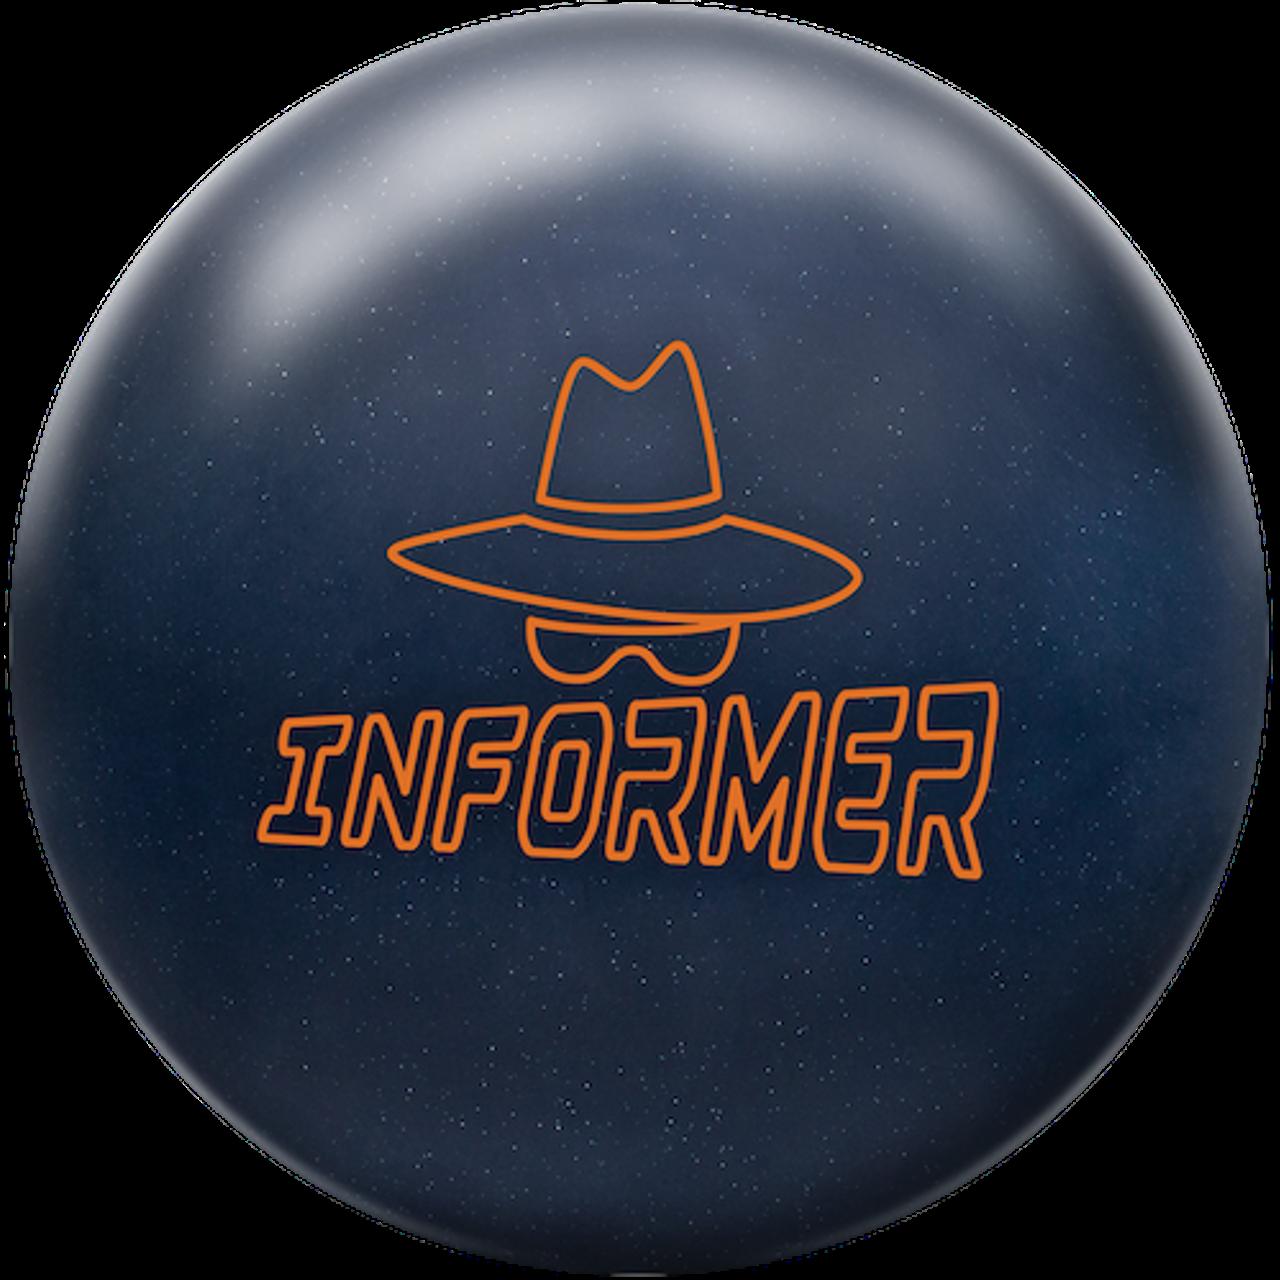 Radical Informer Bowling Ball